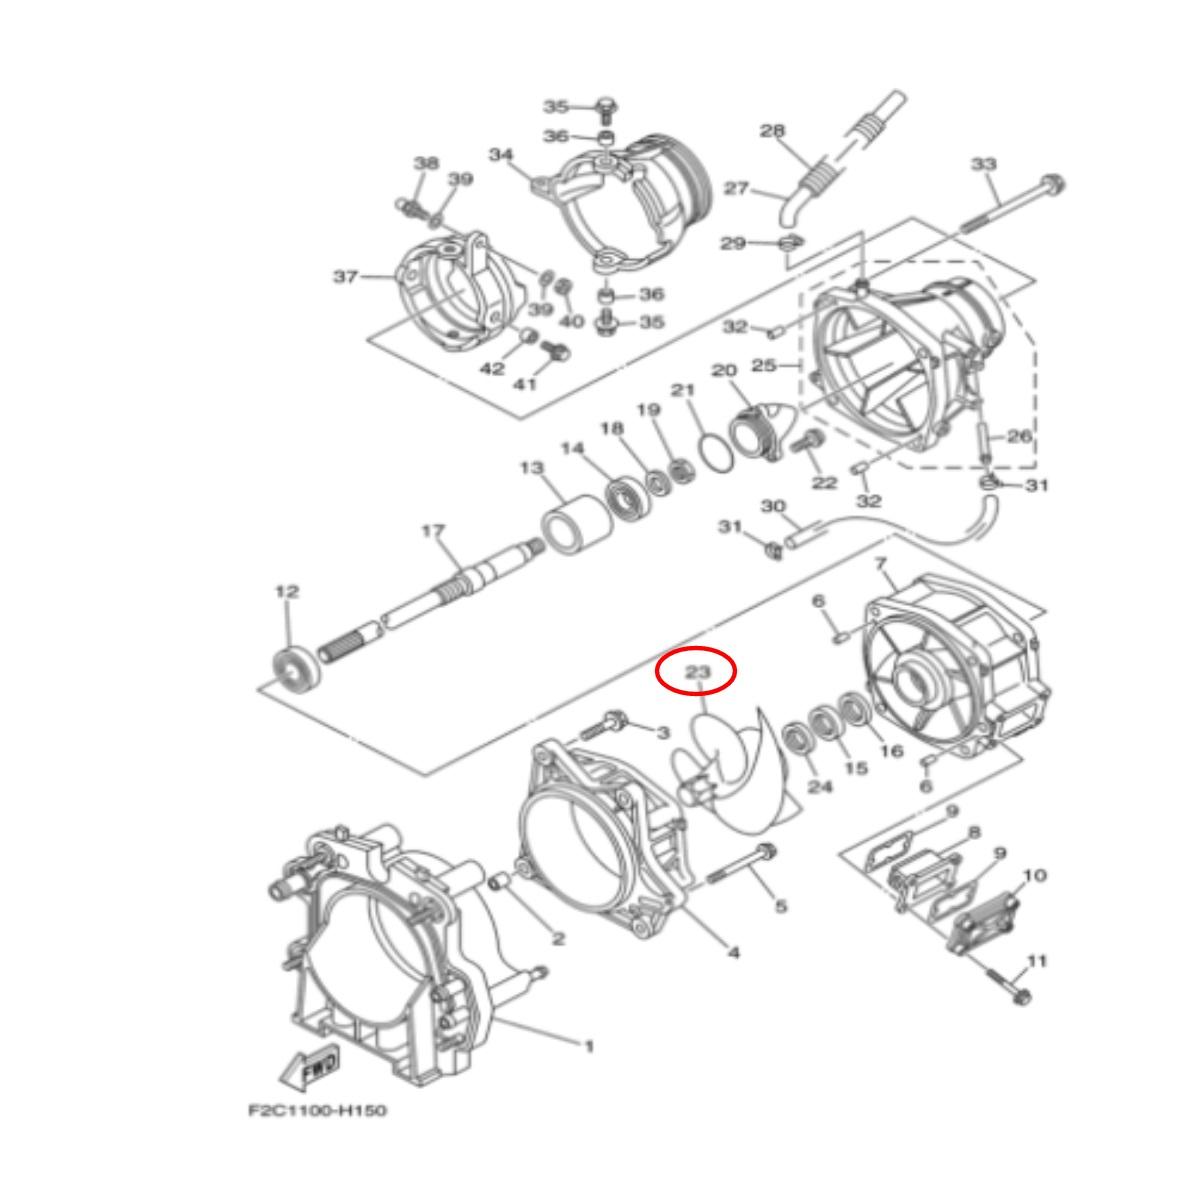 Hélice Solas para Jet Ski Yamaha Gp 1300 R /Xlt 1200 155mm  13/19  - Radical Peças - Peças para Jet Ski